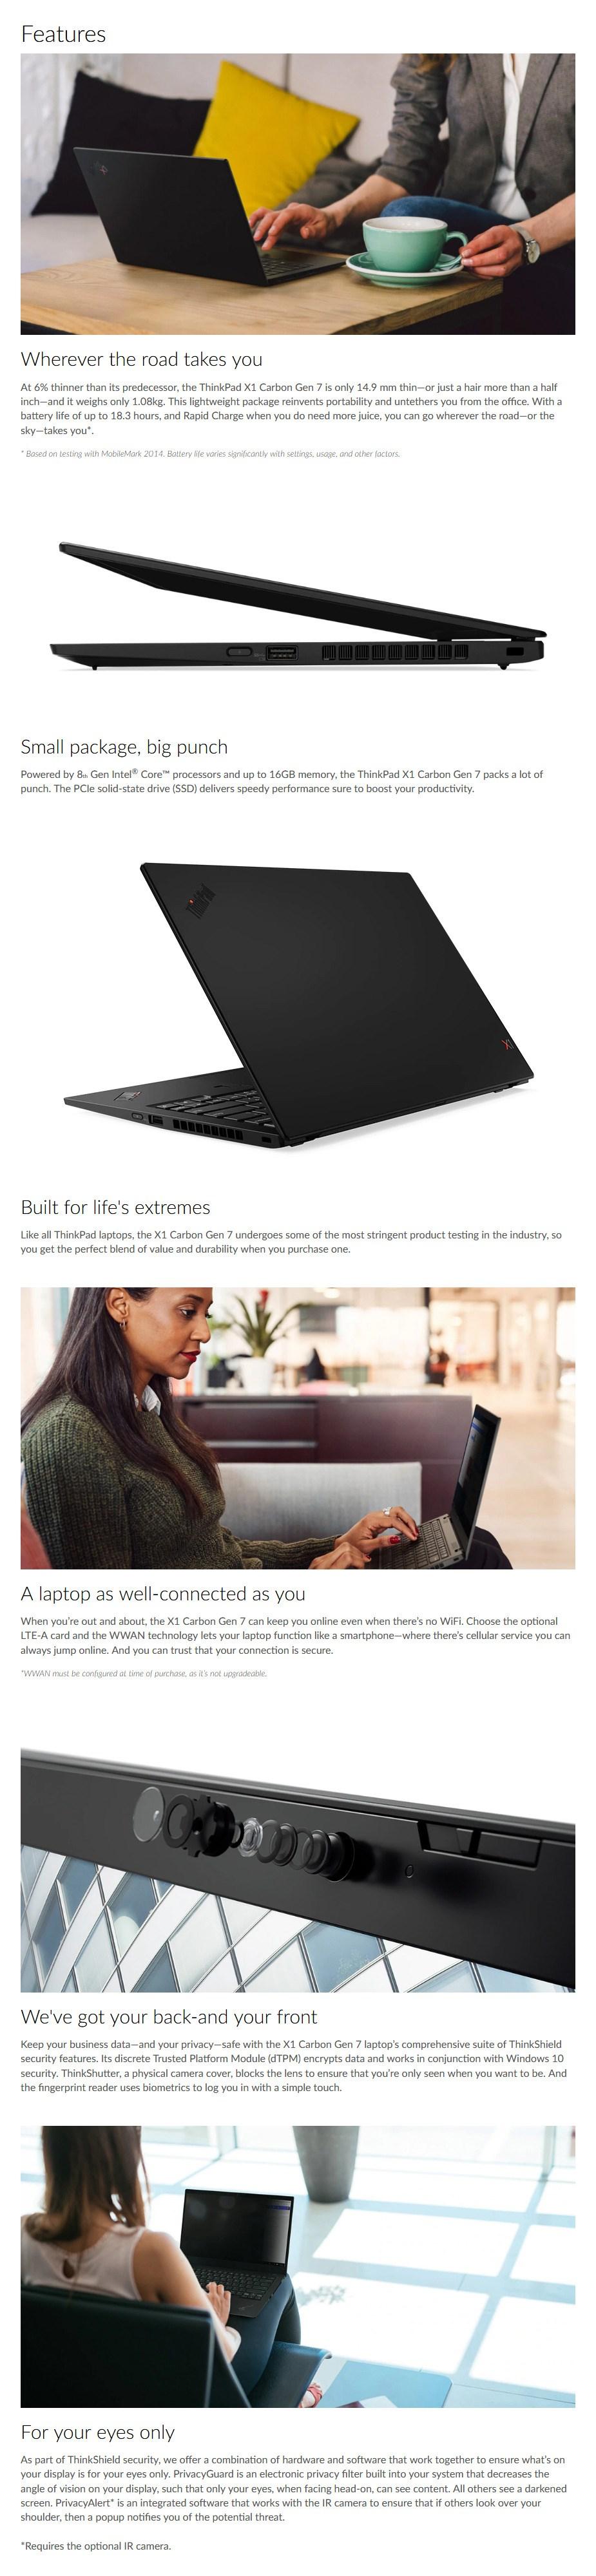 "Lenovo ThinkPad X1 Carbon G7 14"" Laptop i7-8565U 16GB 1TB W10P - Overview 1"